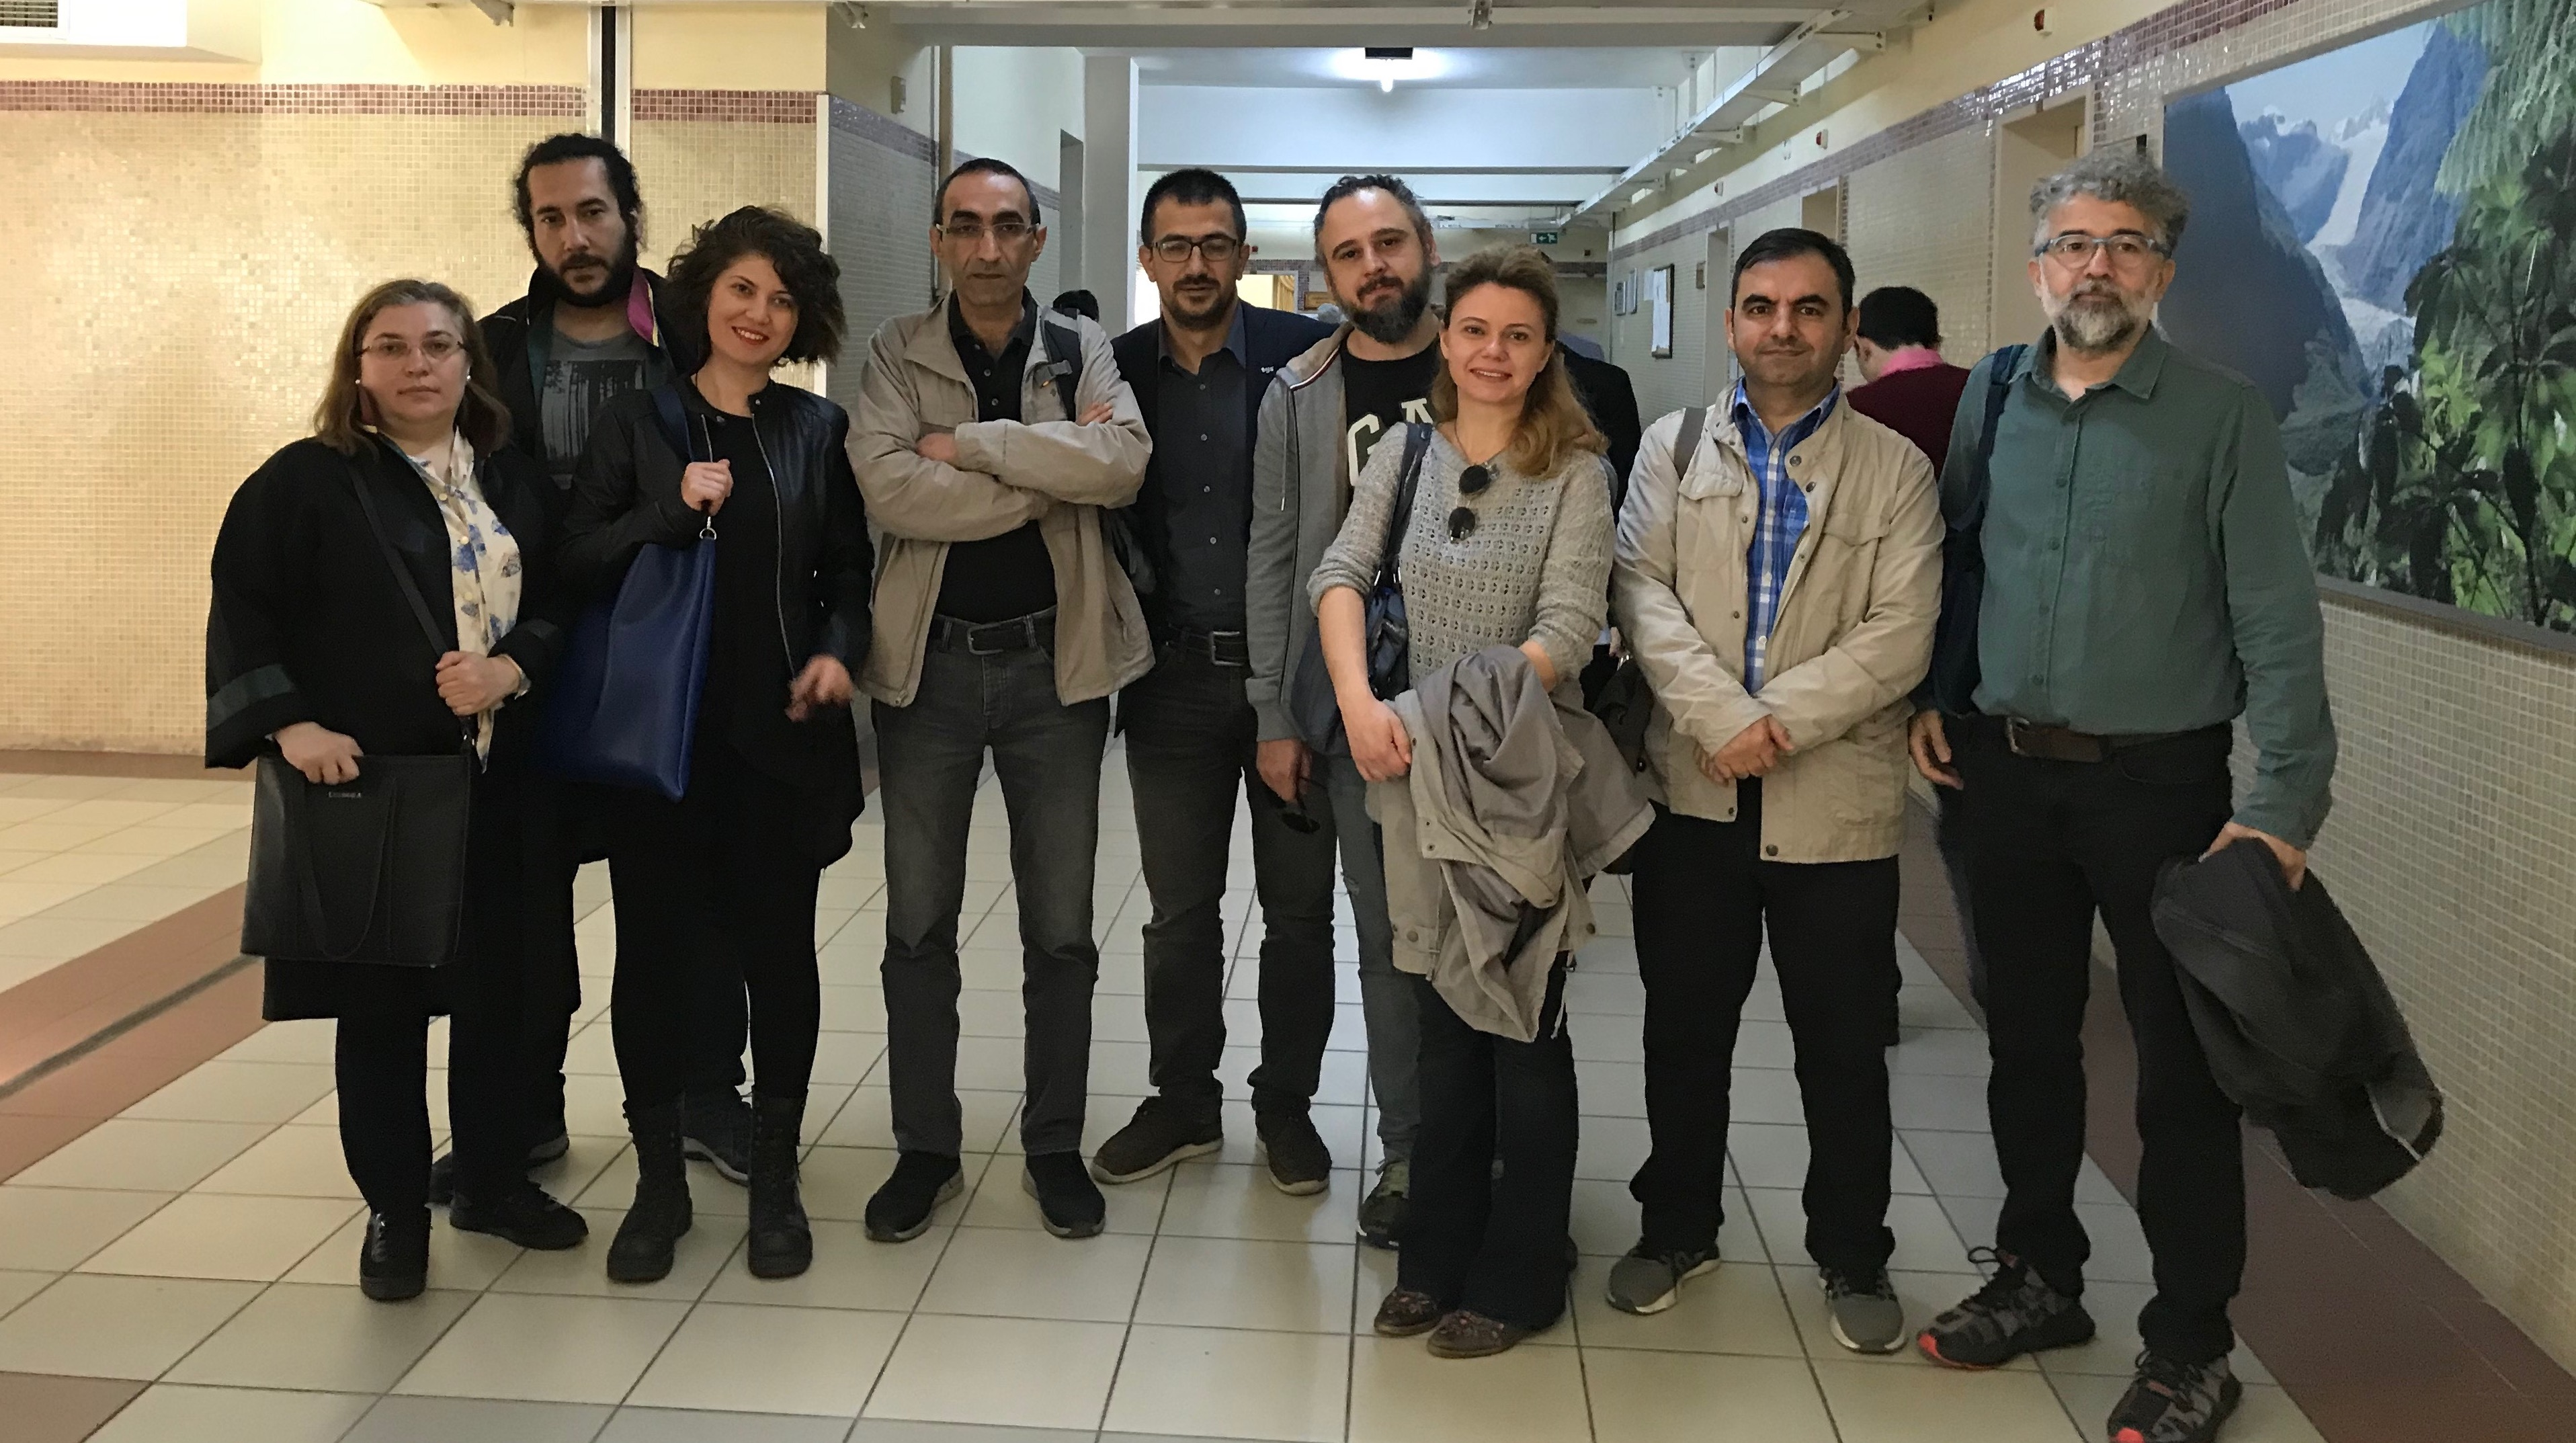 Fatih Polat's trial on